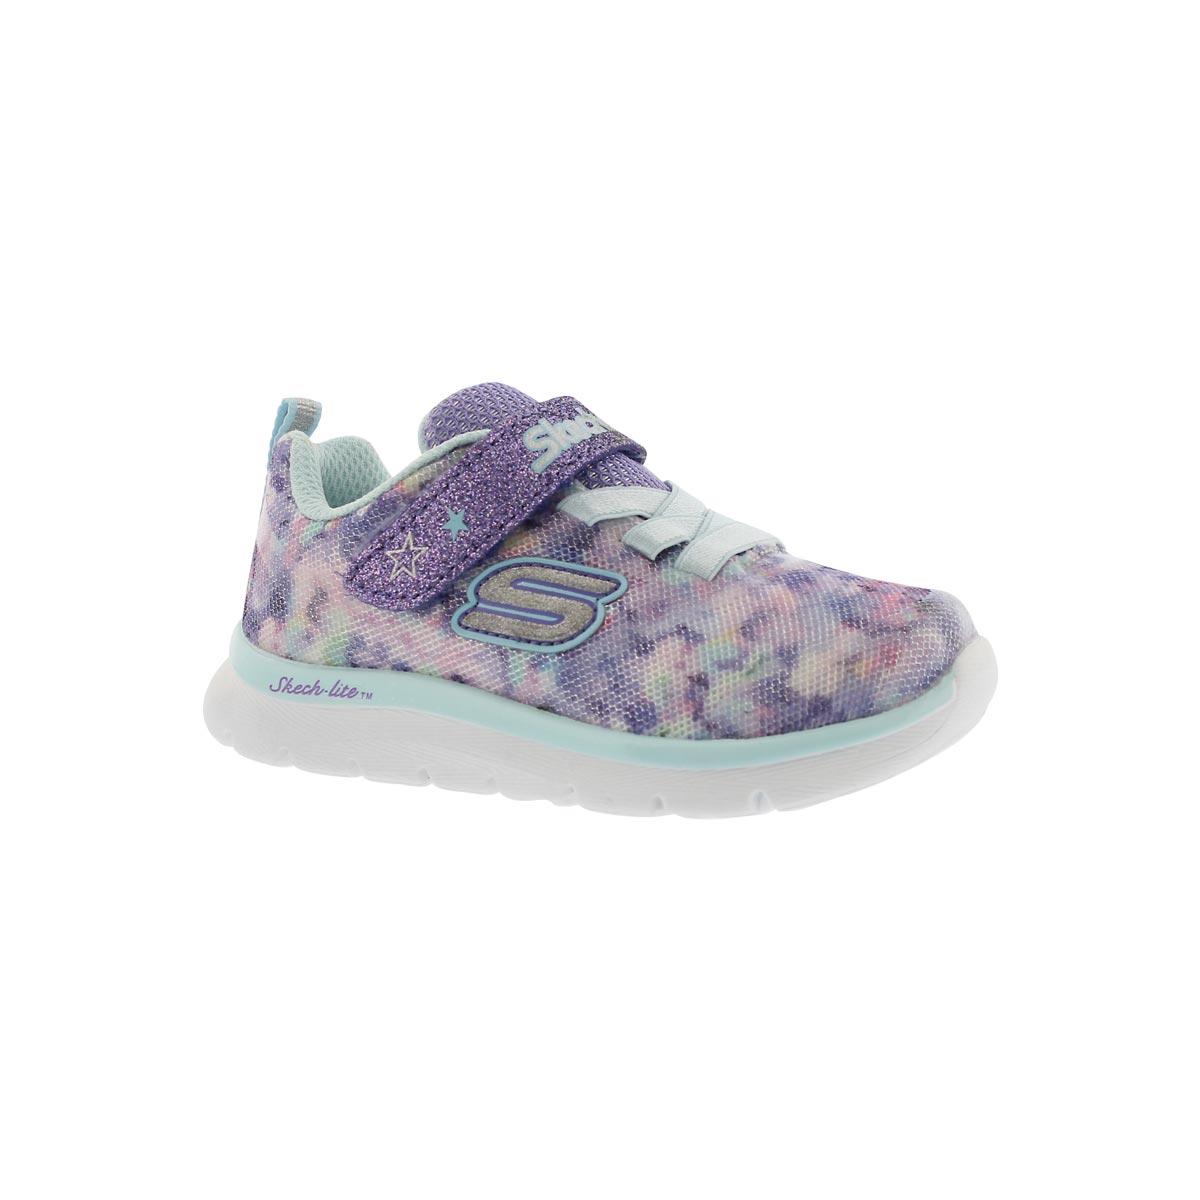 Inf-g Skech-Lite purple floral sneaker